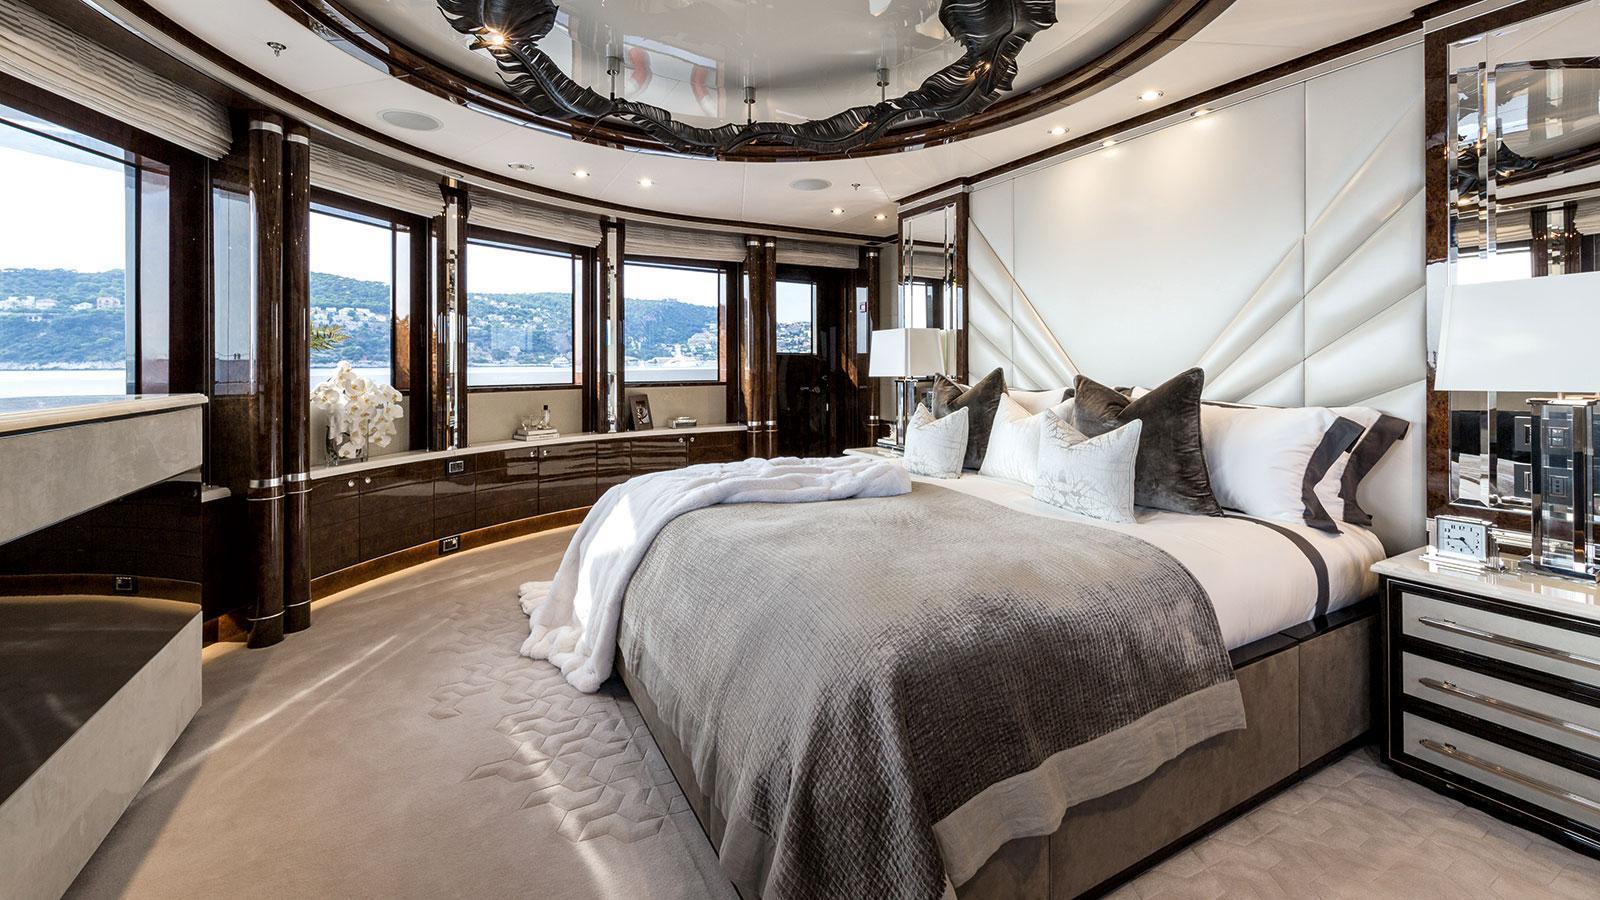 1111-motor-yacht-benetti-2015-63m-state-room